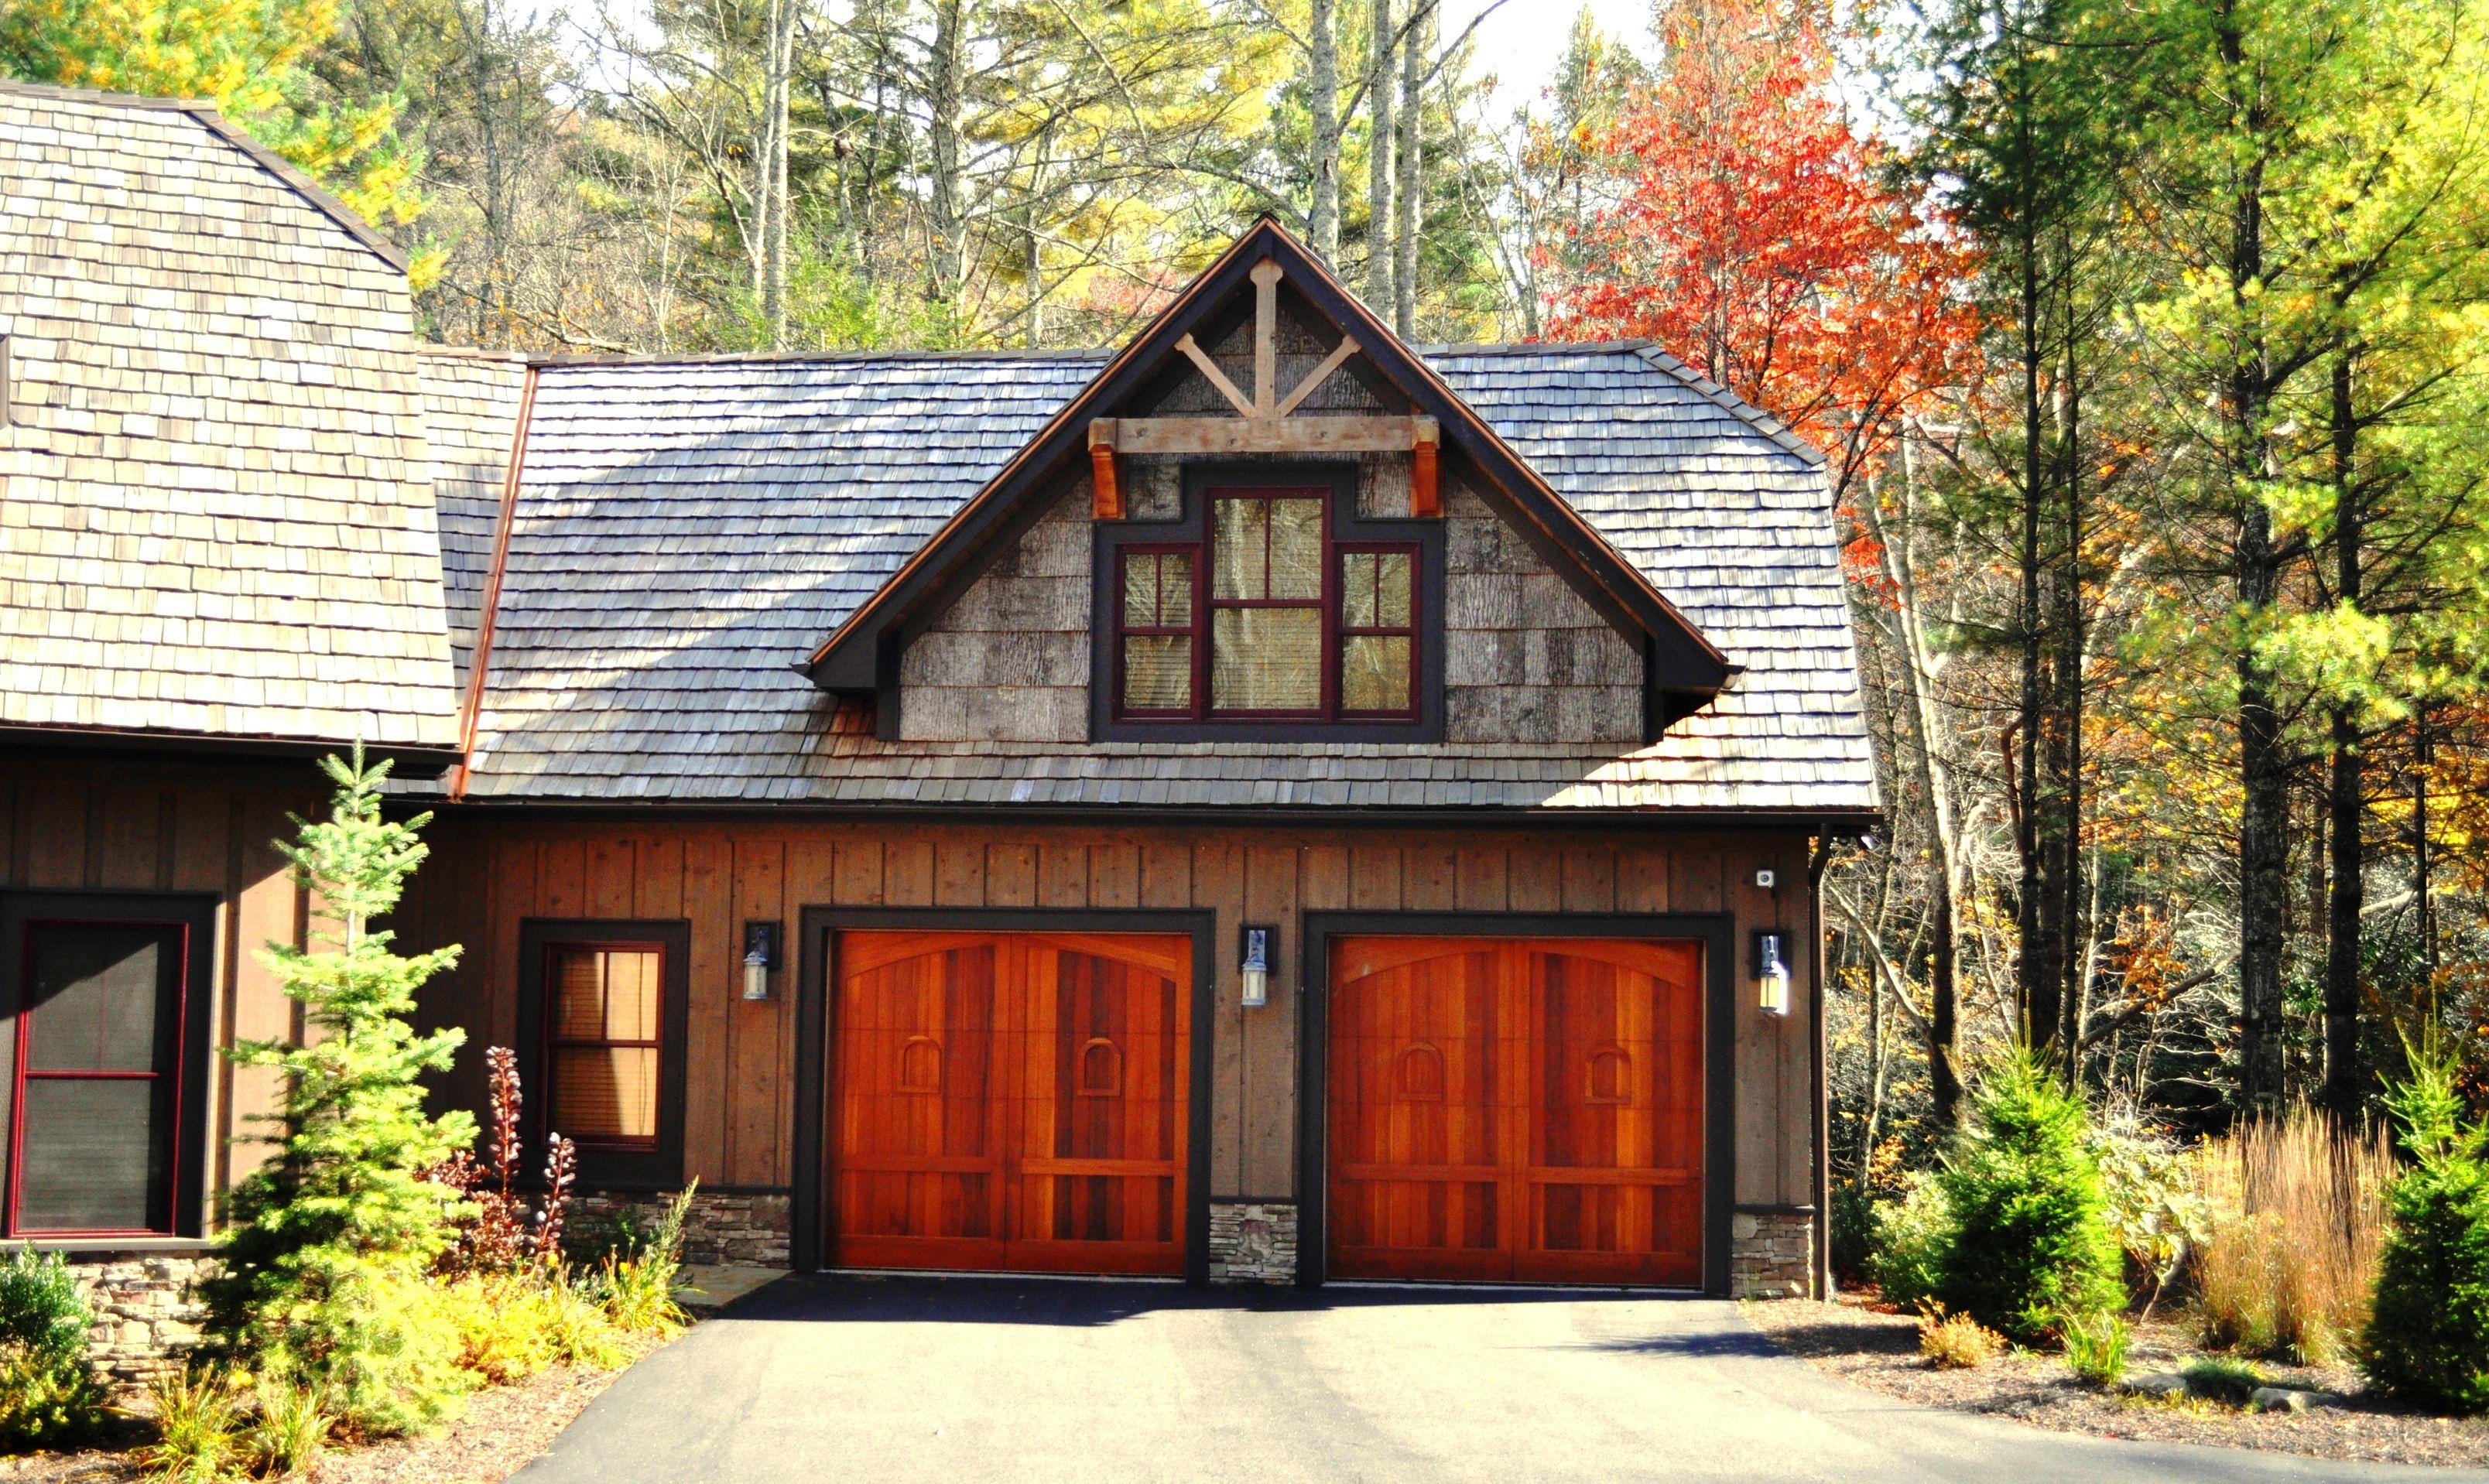 1918 #B73C14 Beautiful Garage Doors (VPC Builders) Rustic Wood Doors Pinterest pic Beautiful Garage Doors 38013216